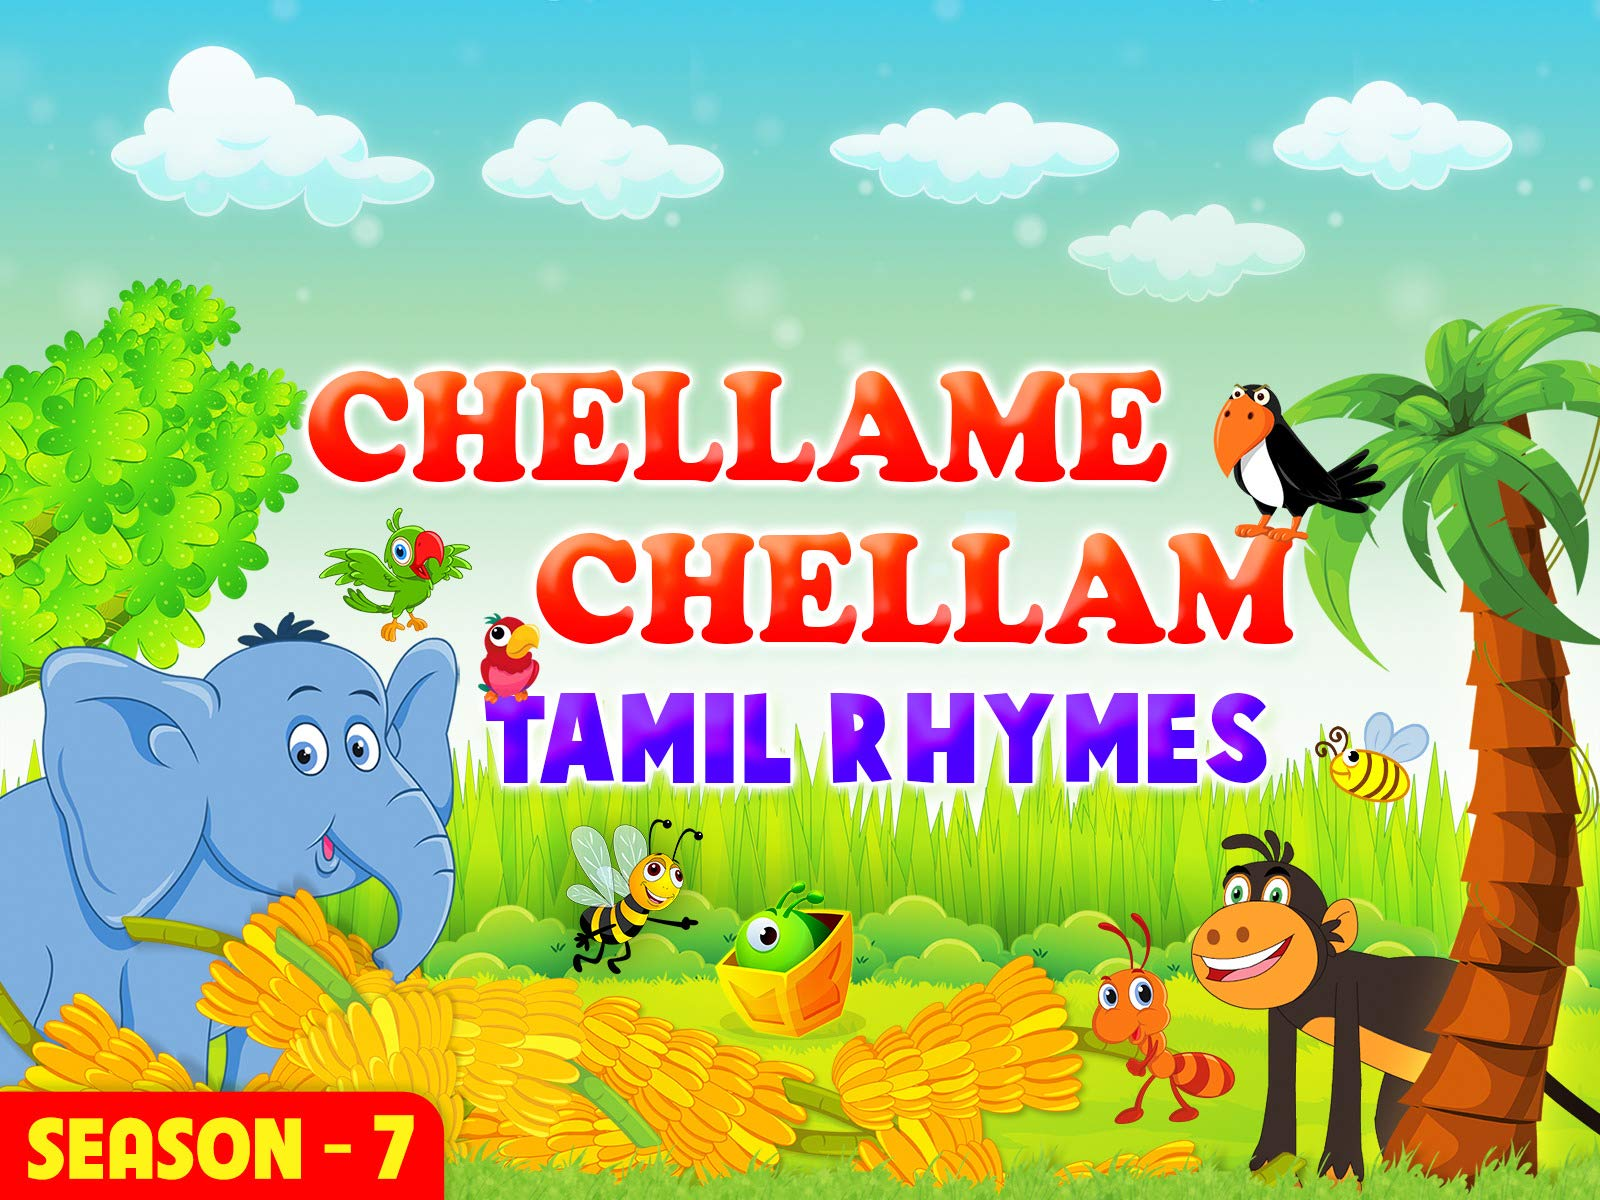 Chellame Chellam - Season 7